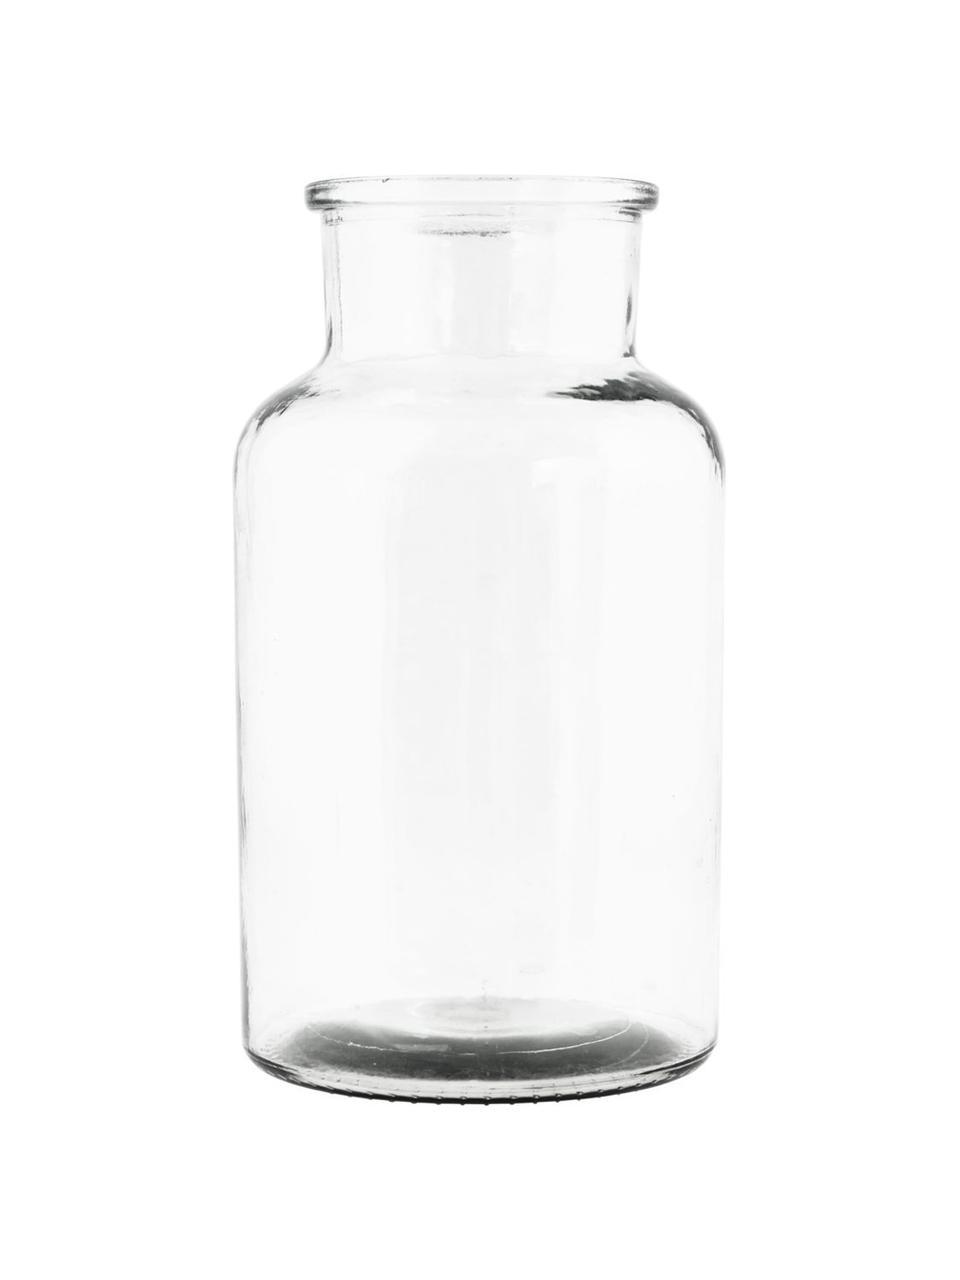 Glas-Vase Jaredya, Glas, Transparent, Ø 14 x H 26 cm